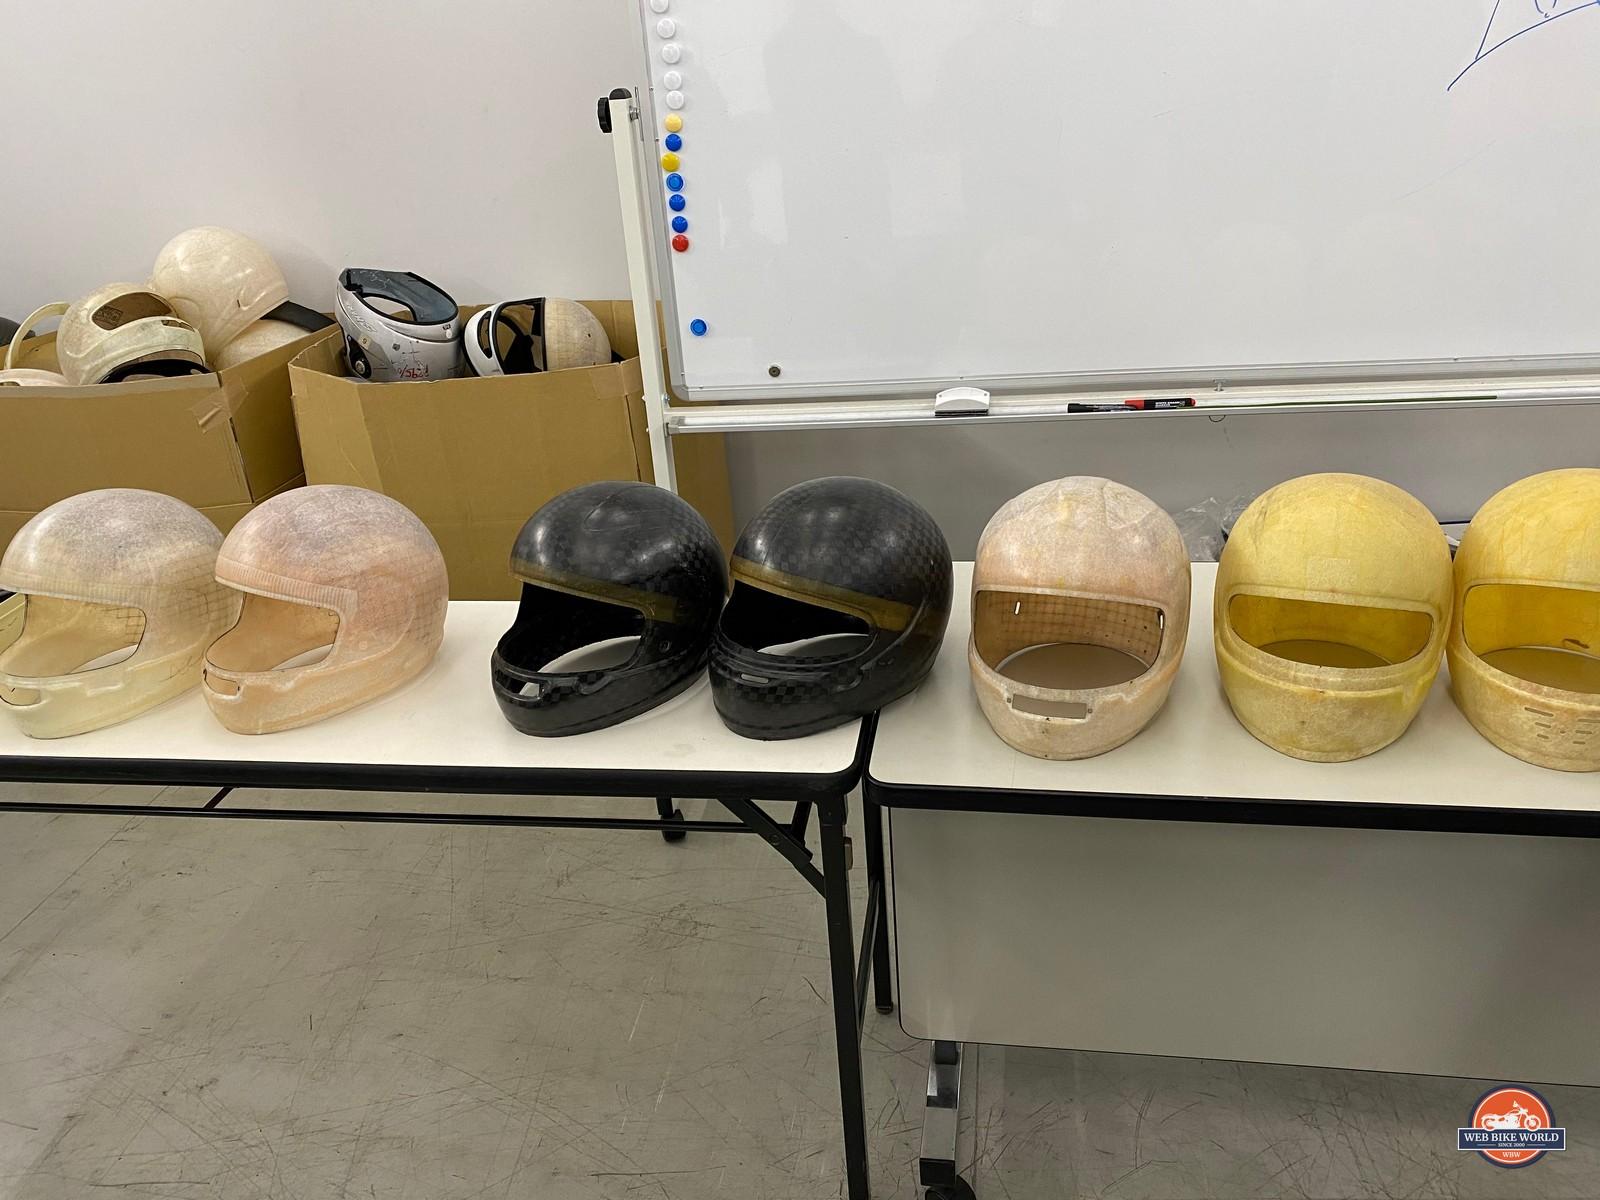 Arai helmet shells throughout history.